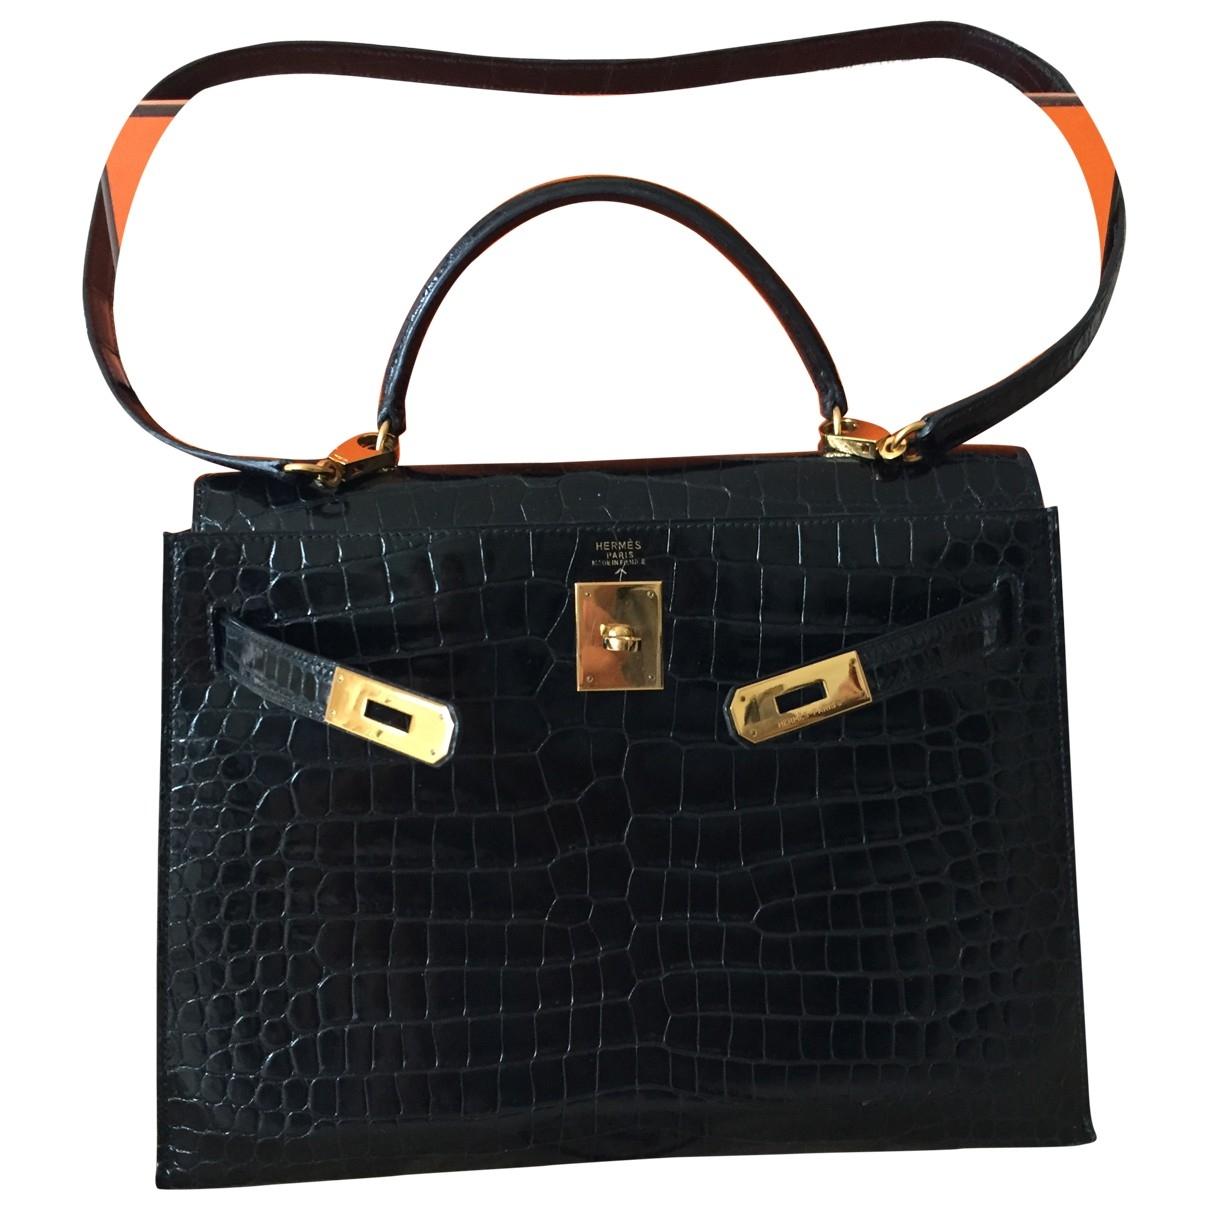 Hermes Kelly 32 Handtasche in  Schwarz Exotenleder